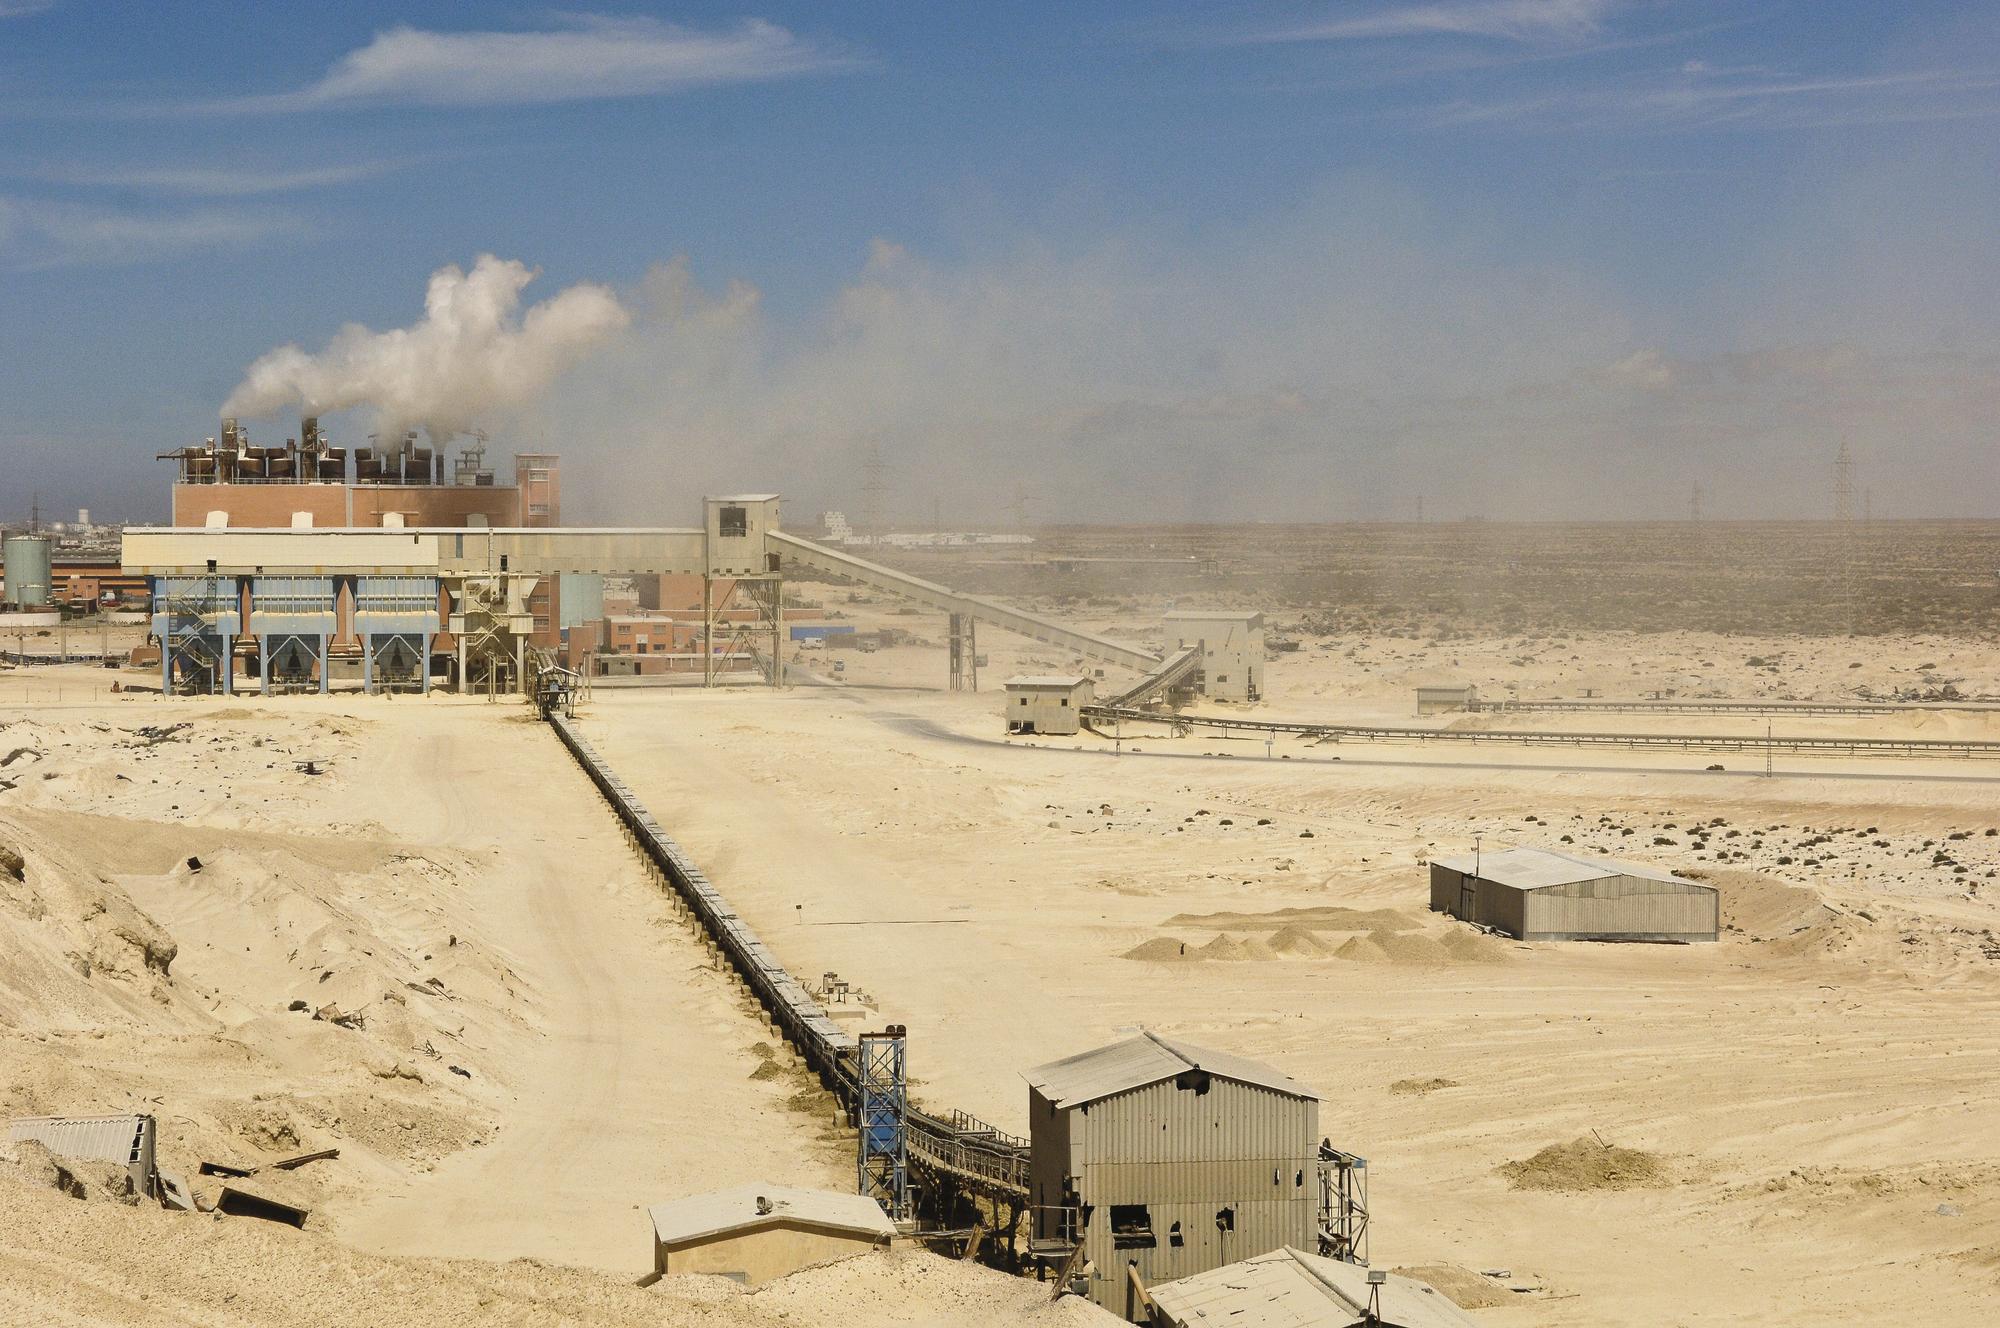 Usine de transformation du phosphate, près de Laayoune, Sahara Occidental (Maroc).